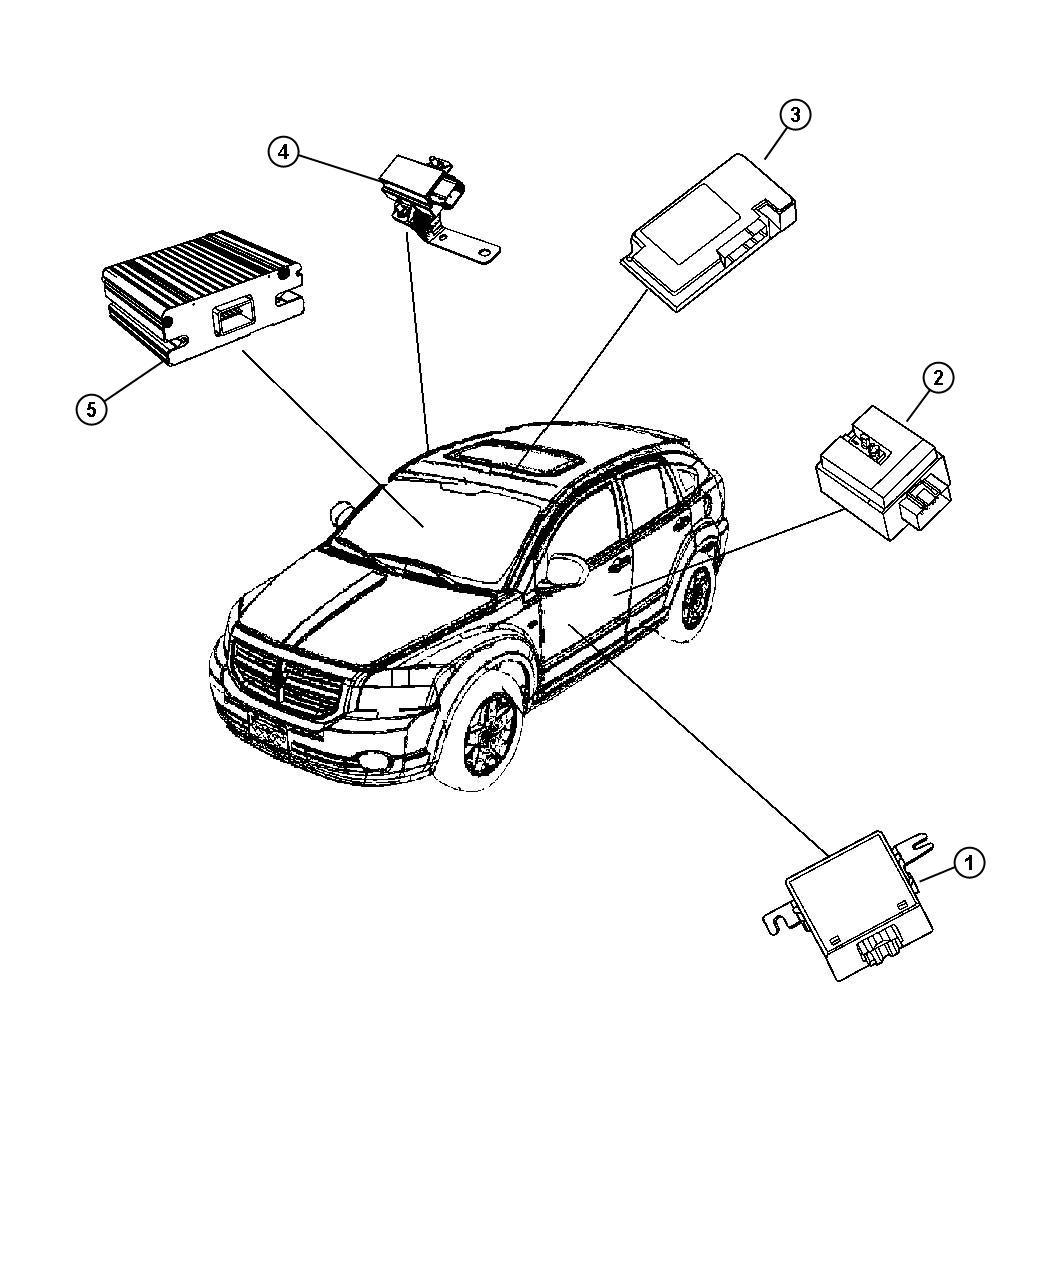 Jeep Module Telematics U Connect Hfm Those